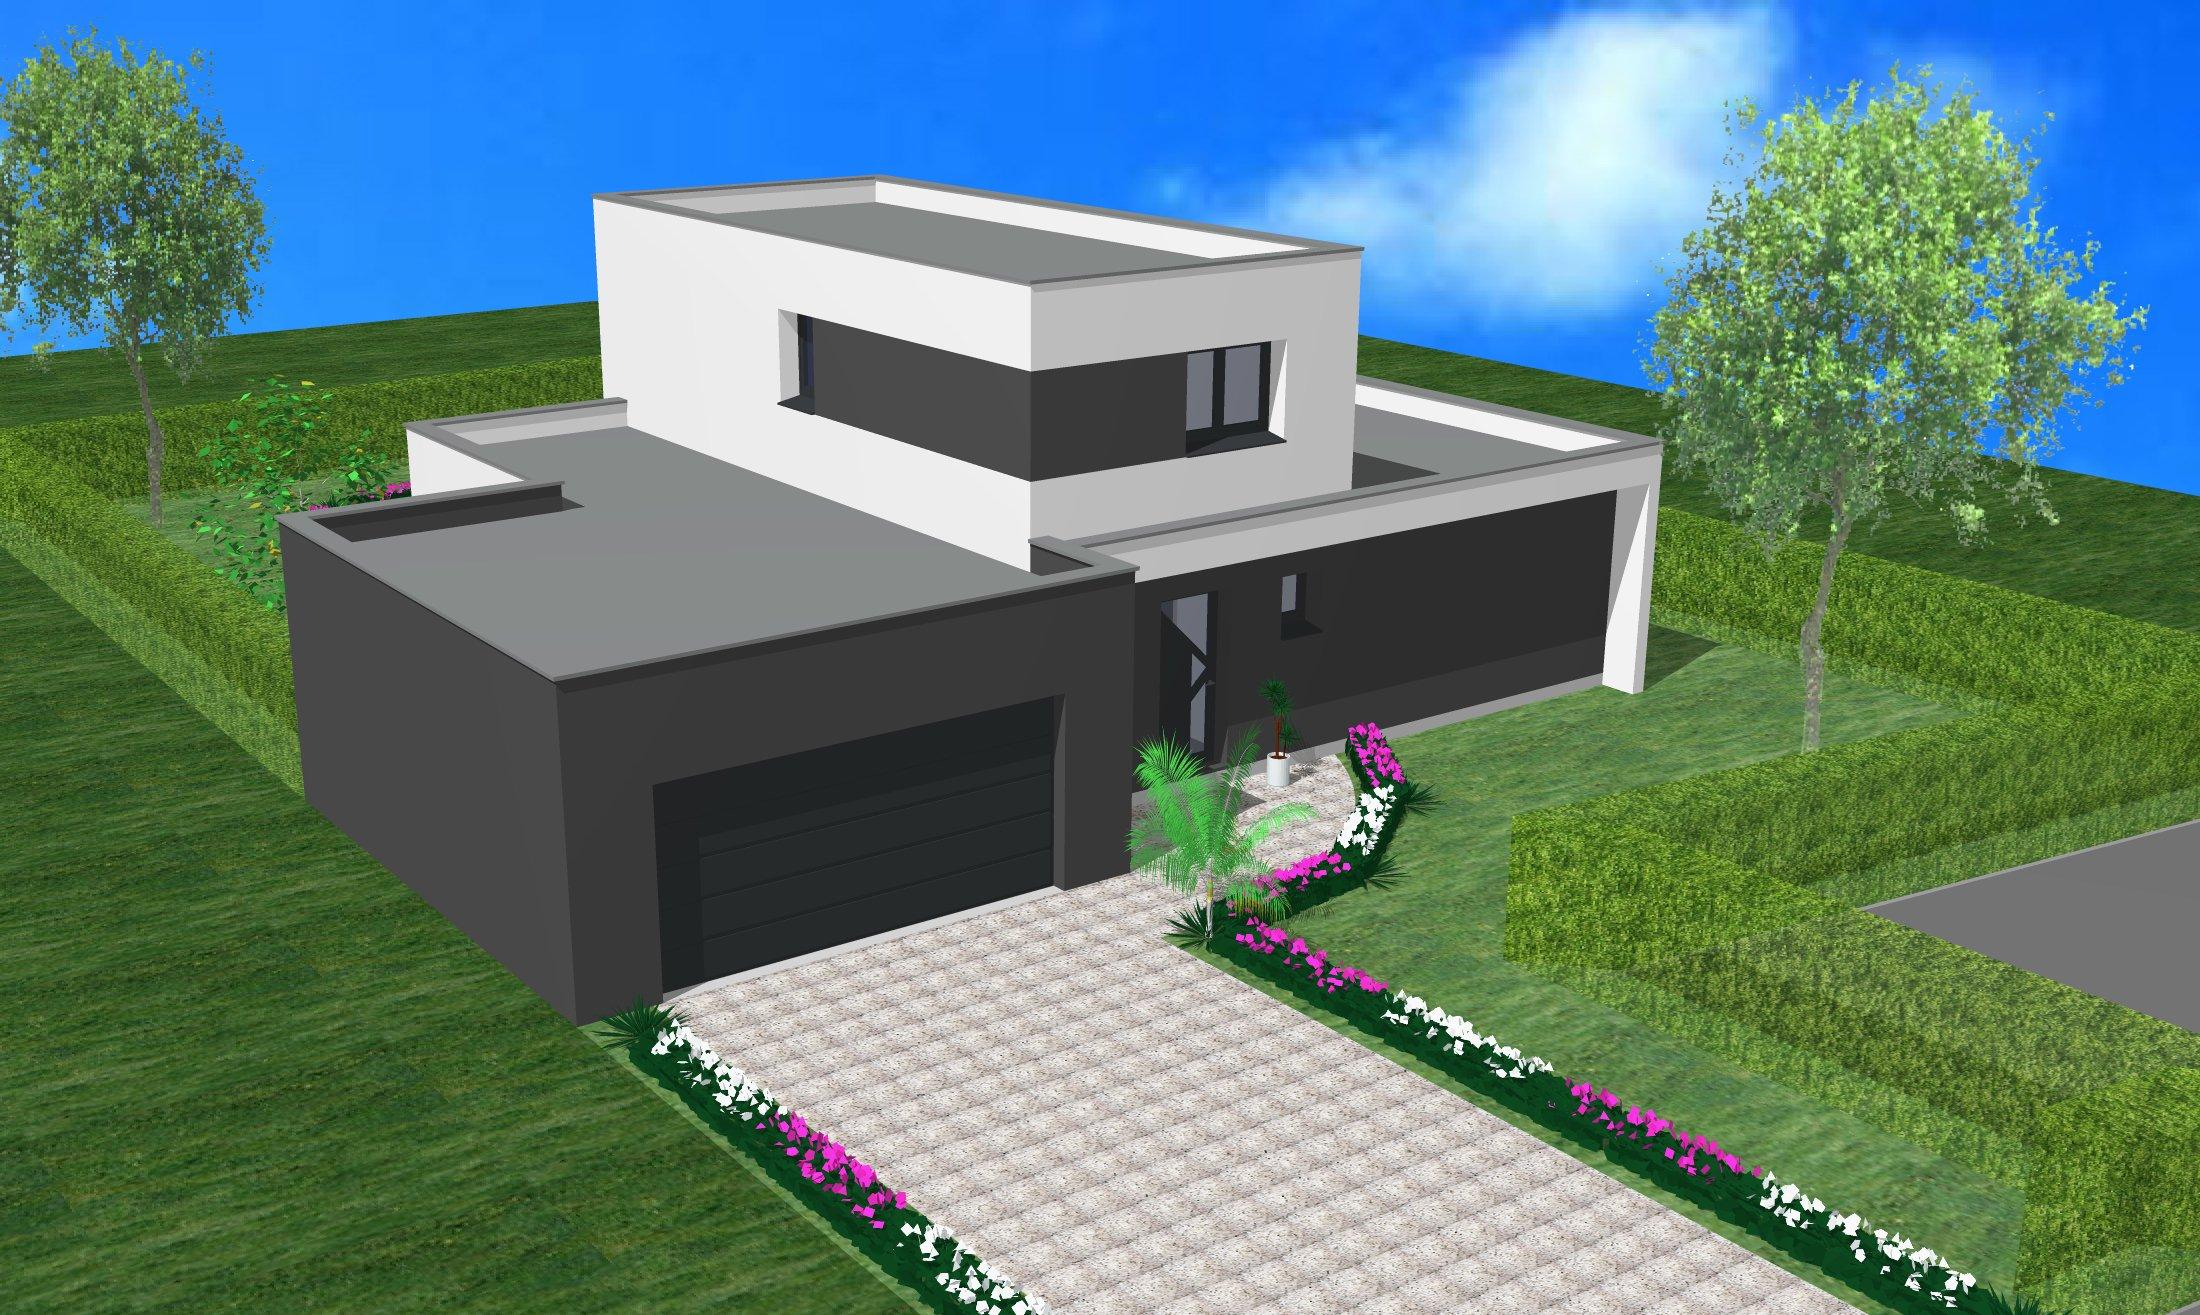 Maisons + Terrains du constructeur CREAGES • 130 m² • UFFHEIM